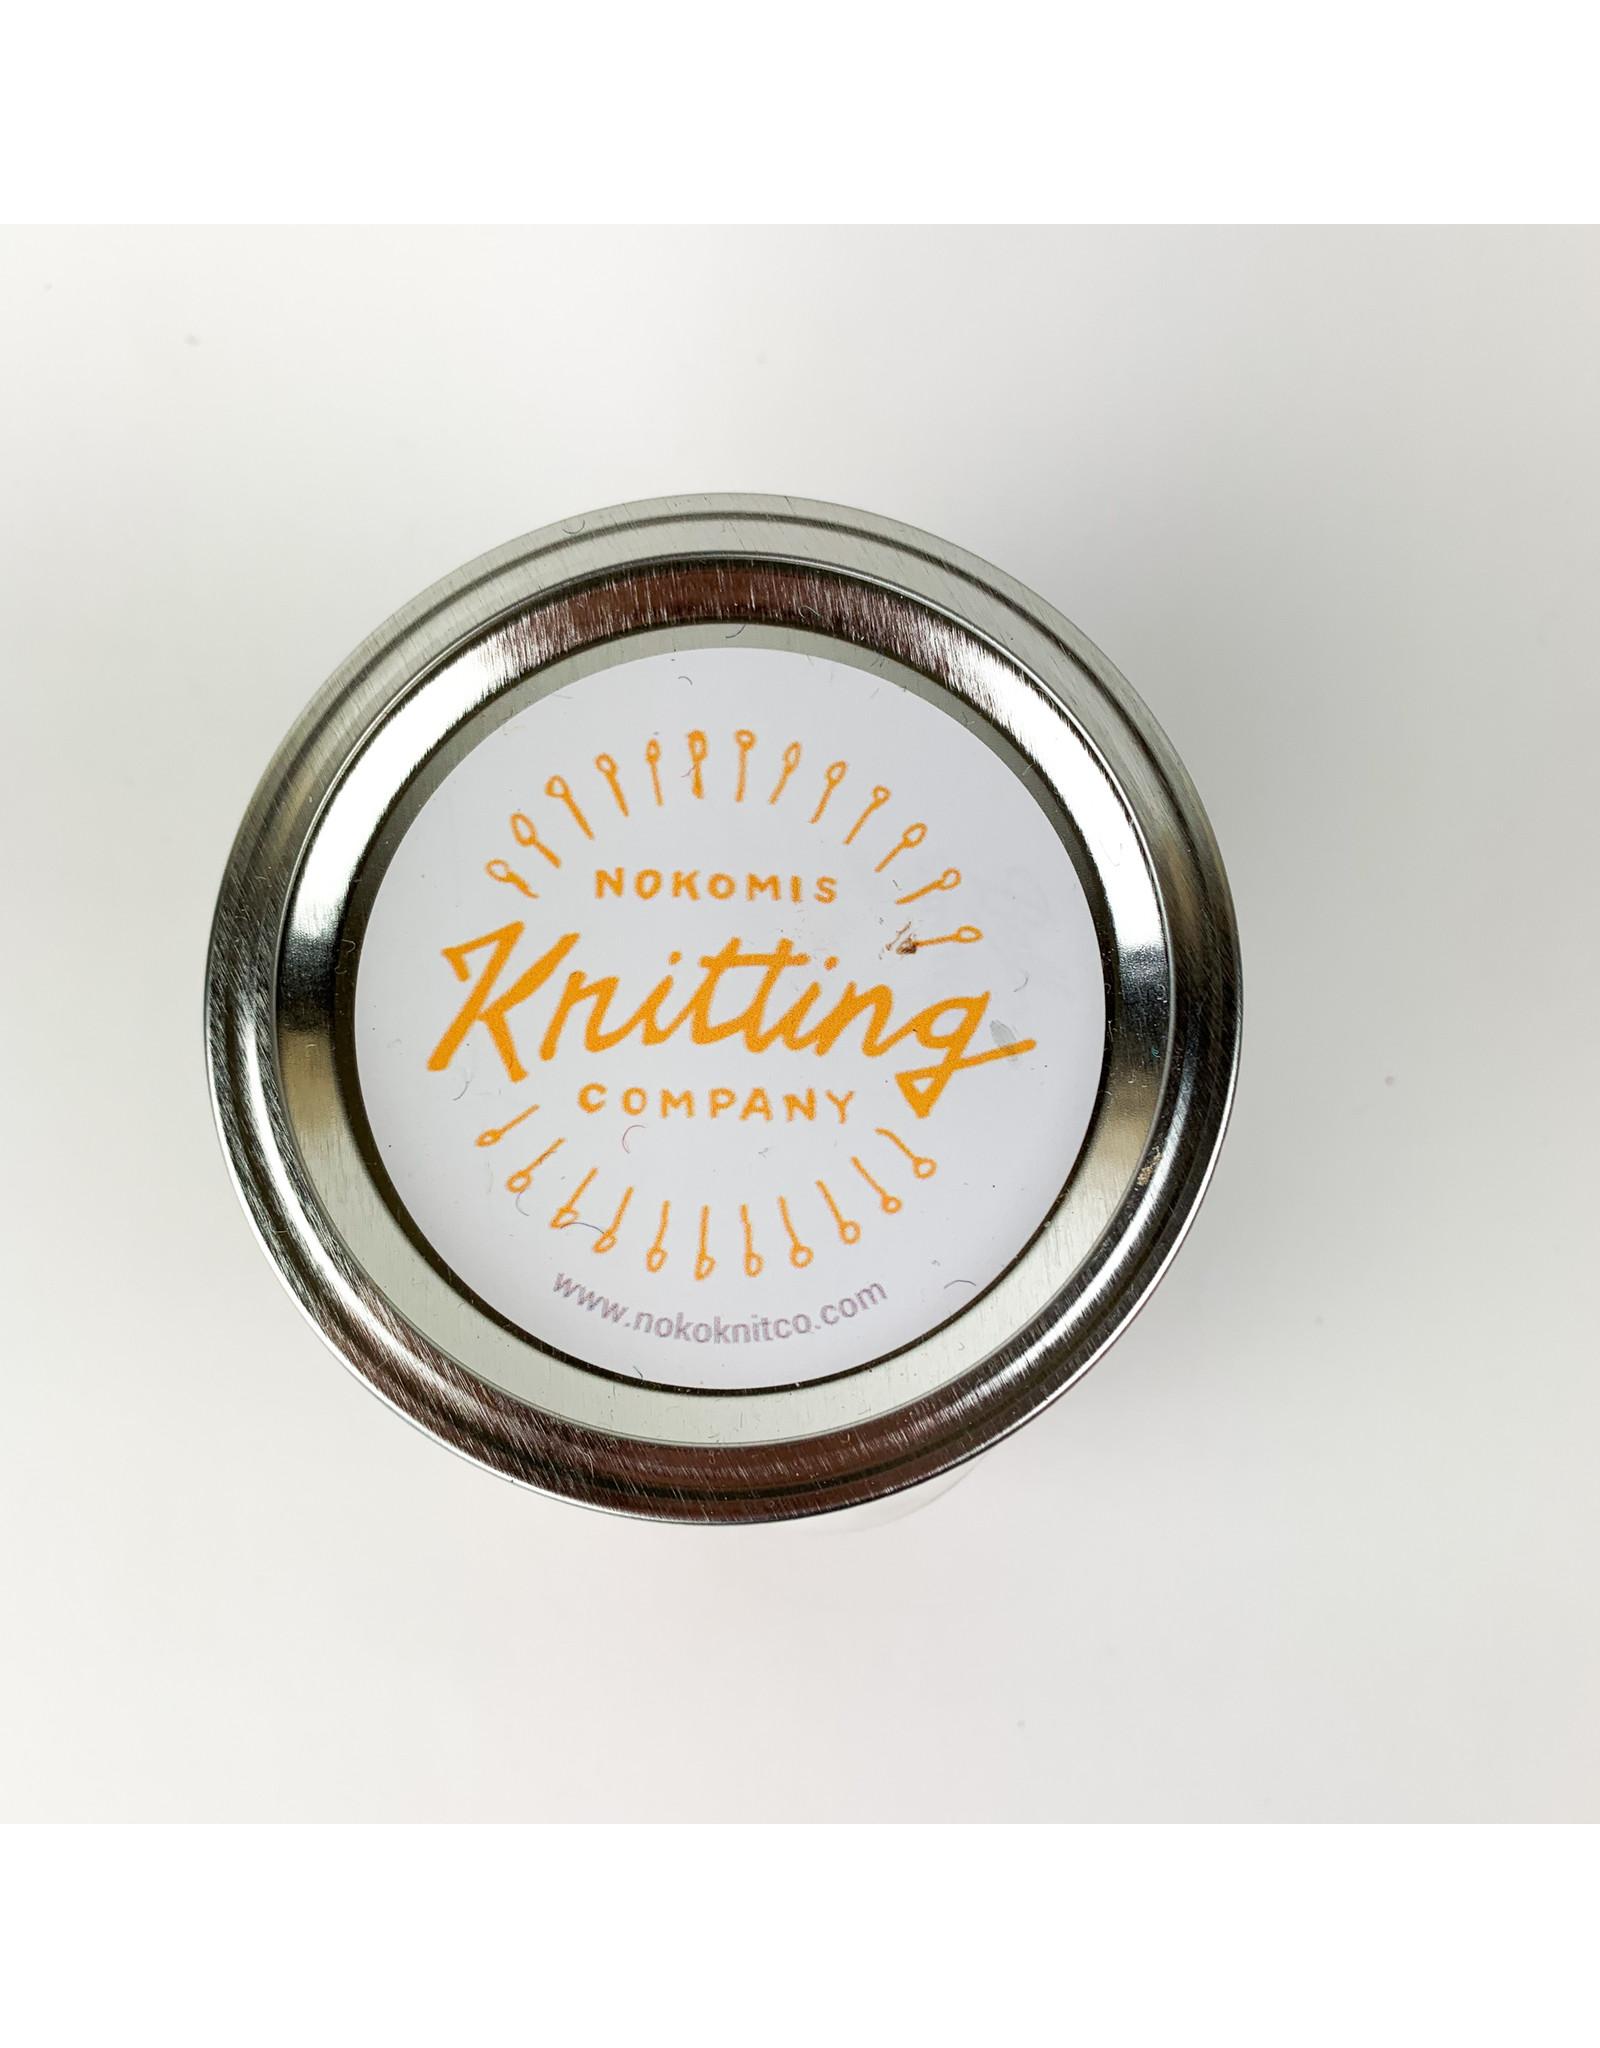 Nokomis Knitting Company Lavender/ Dryer Ball Kits (MN Made)